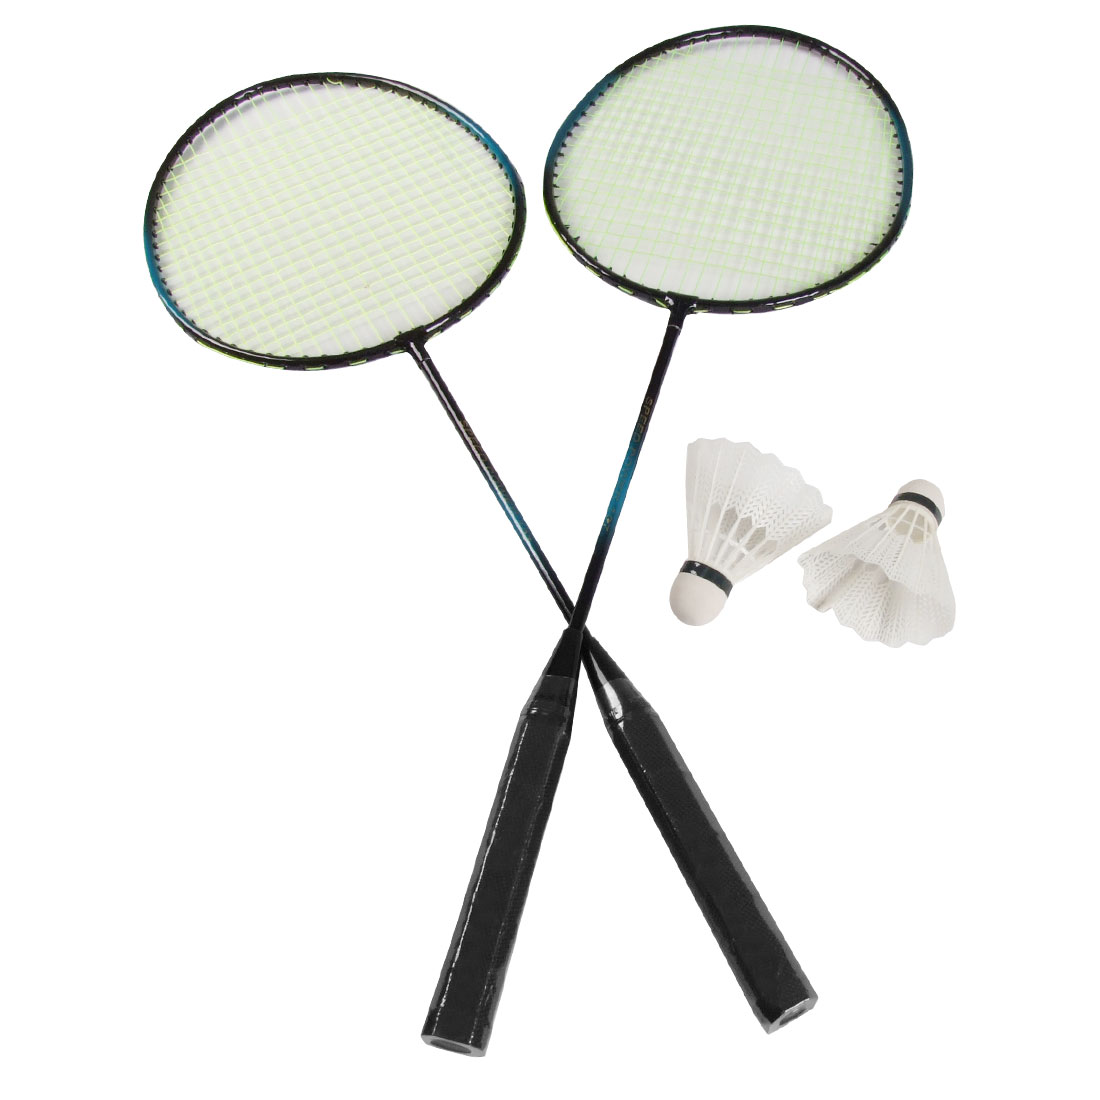 Pair Metal Shaft Head Badminton Rackets Paddles w Shuttlecocks